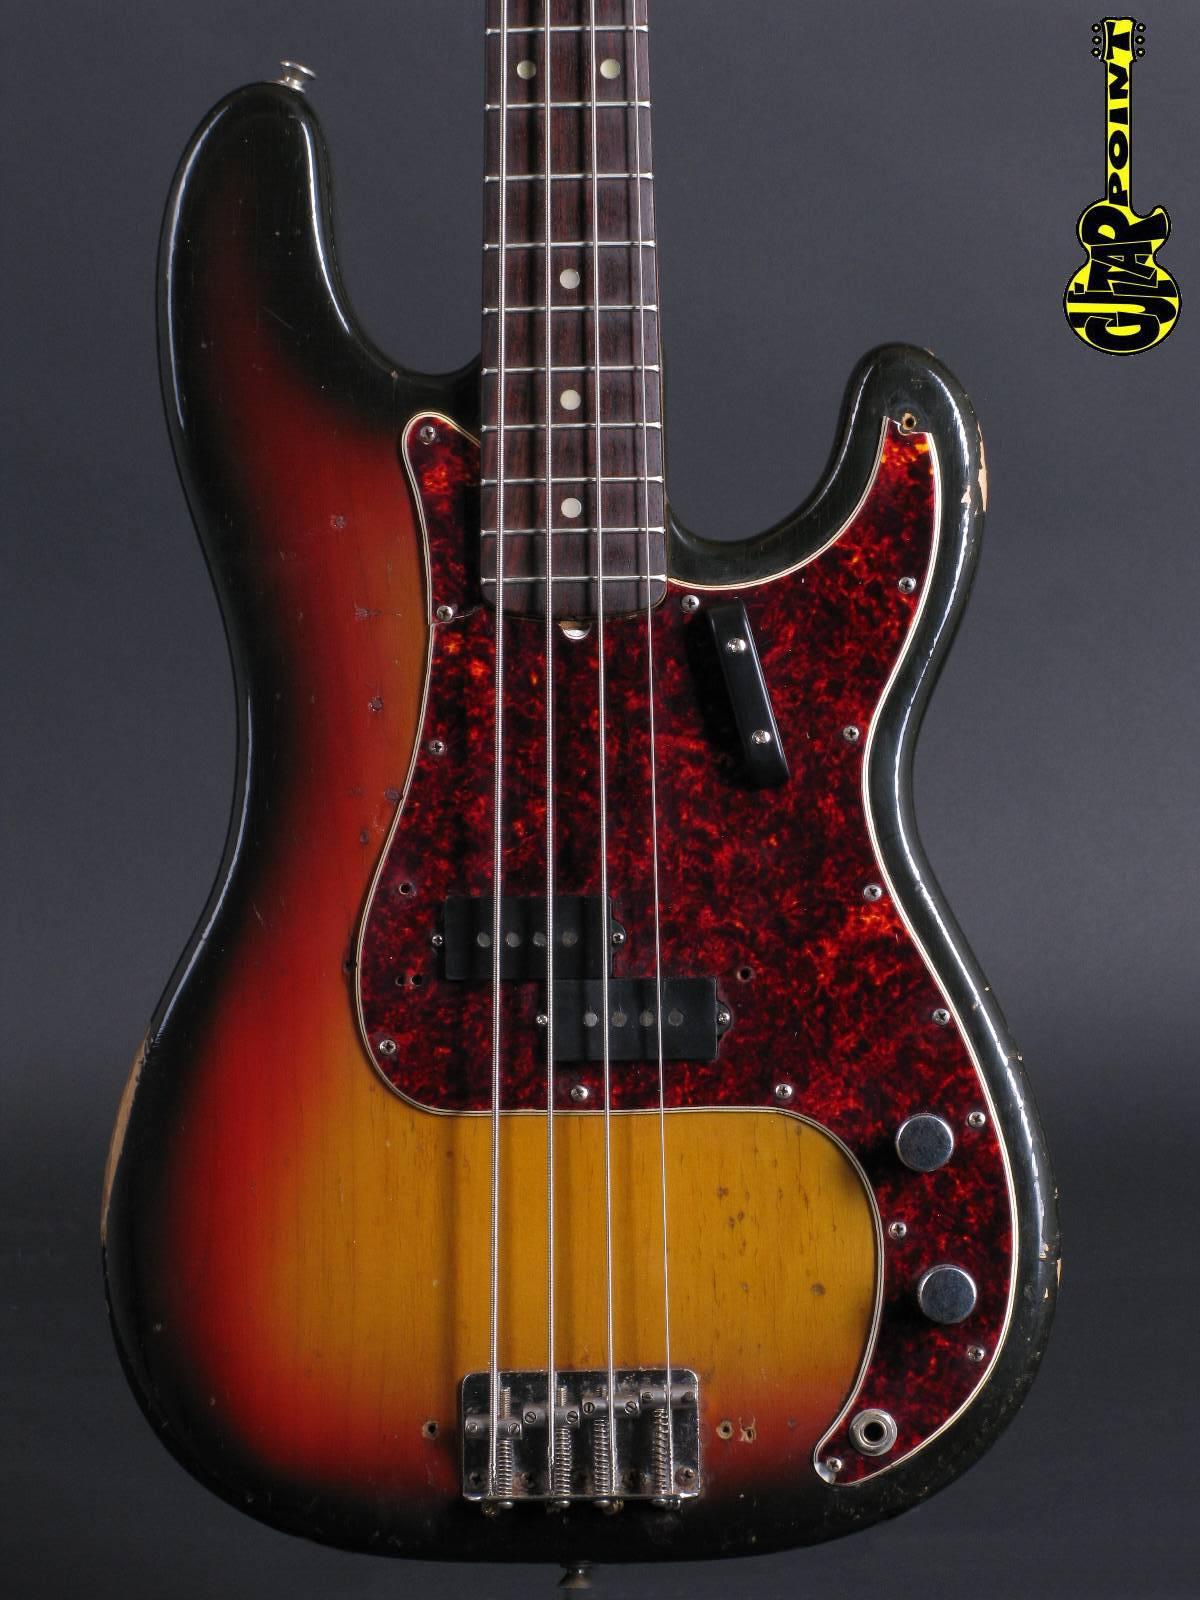 1971 Fender Precision Bass - 3-tone Sunburst